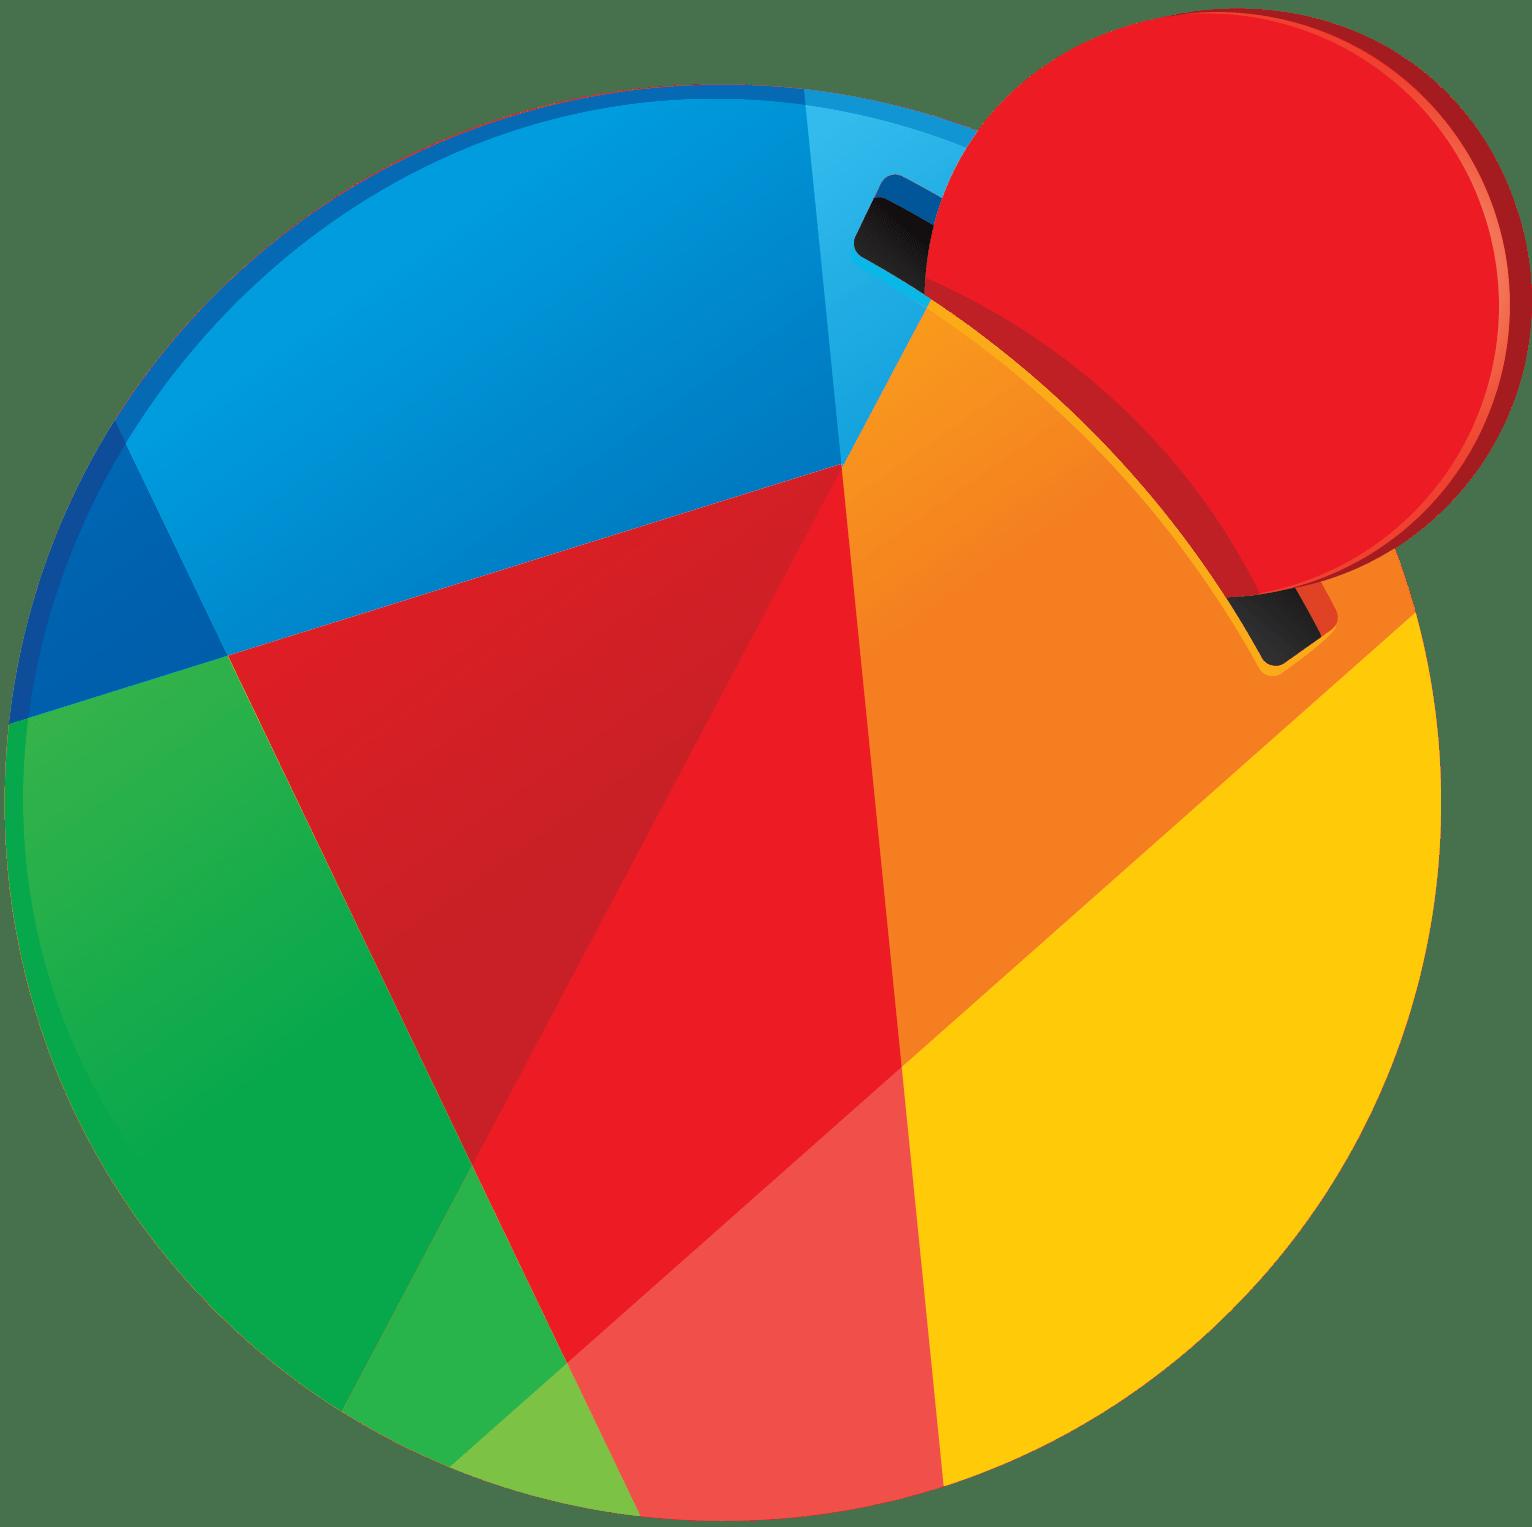 ReddCoin (RDD) Updates ReddID, Bringing It Closer to a Full Public Release 13